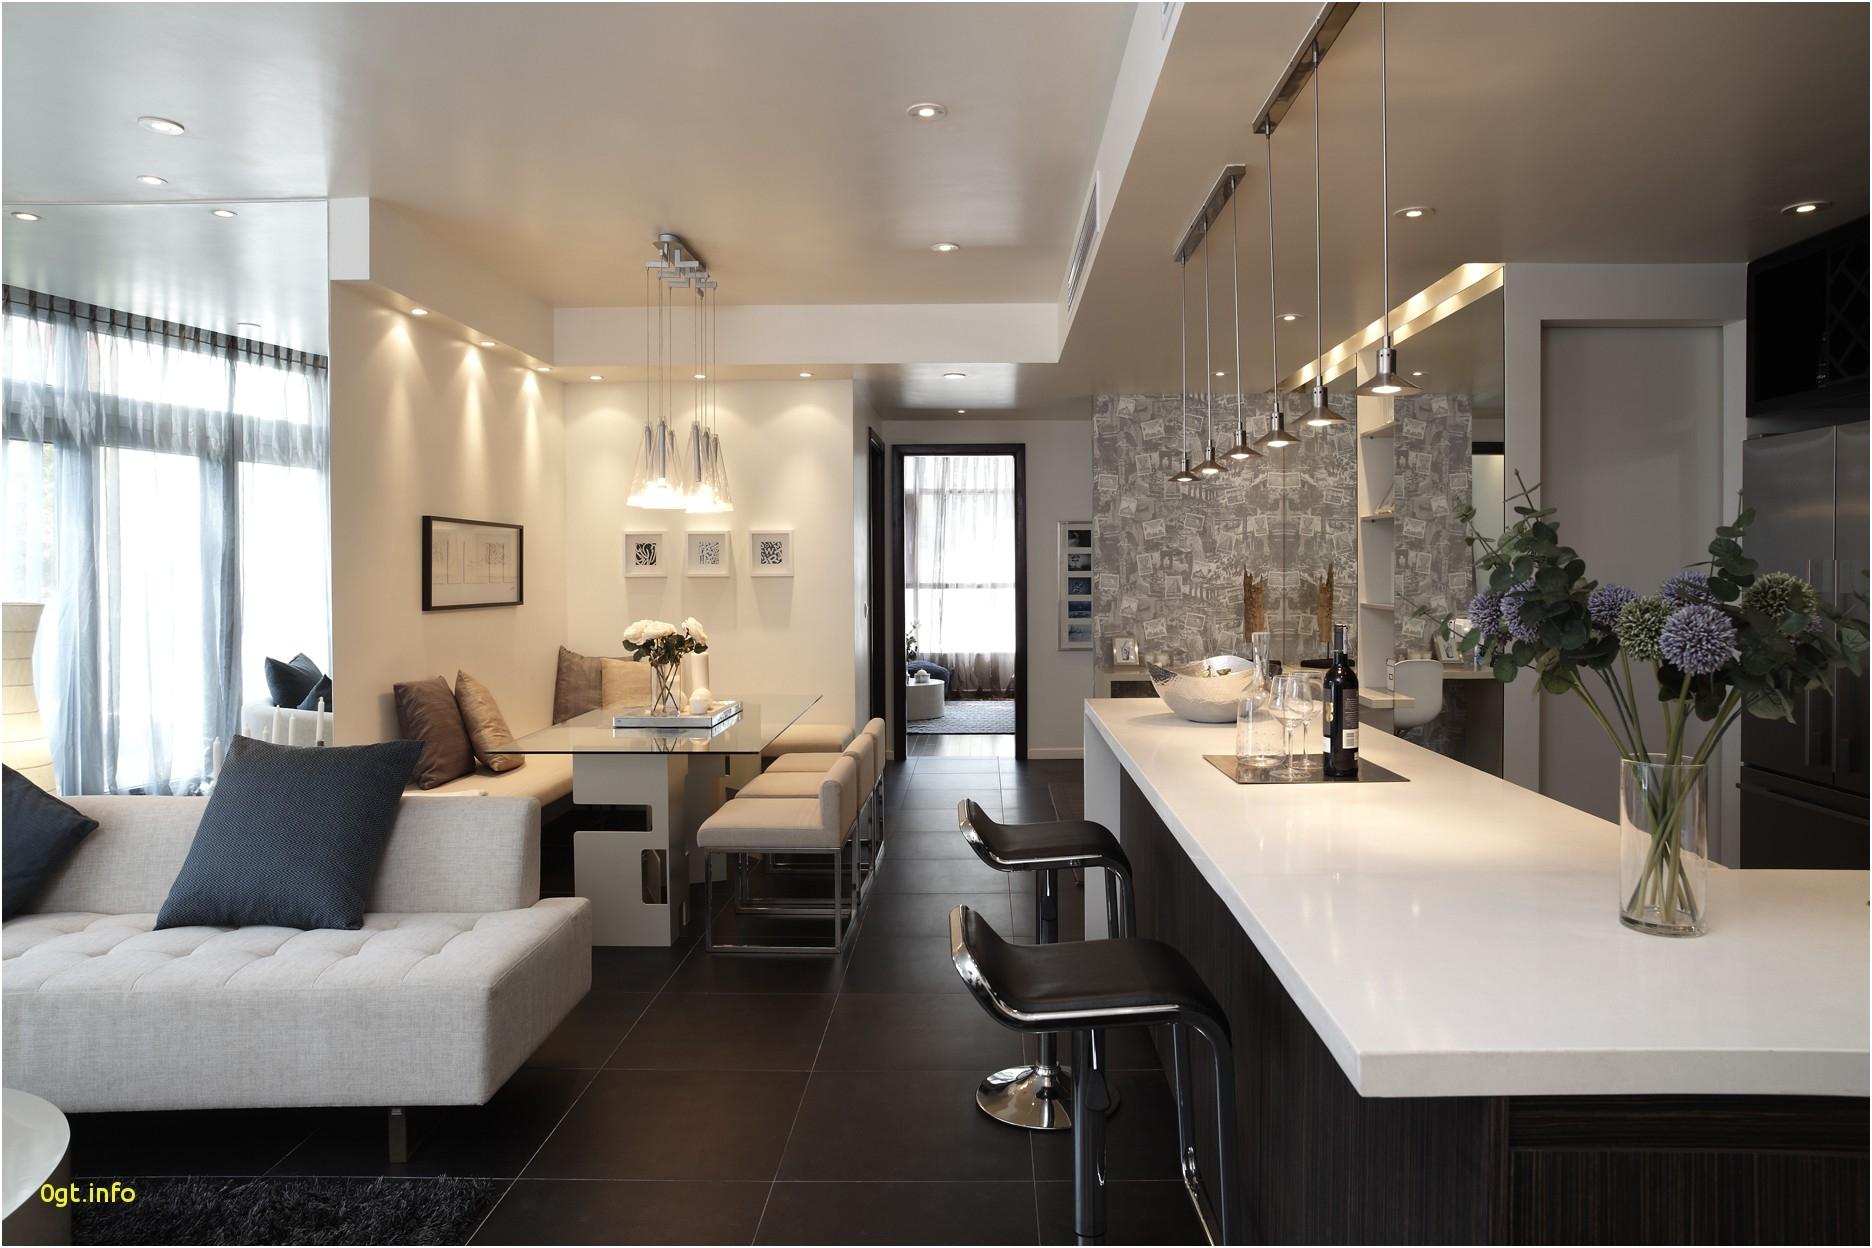 2 bedroom apartments richmond va unique design for bedroom apartments rent in mesquite t and pat